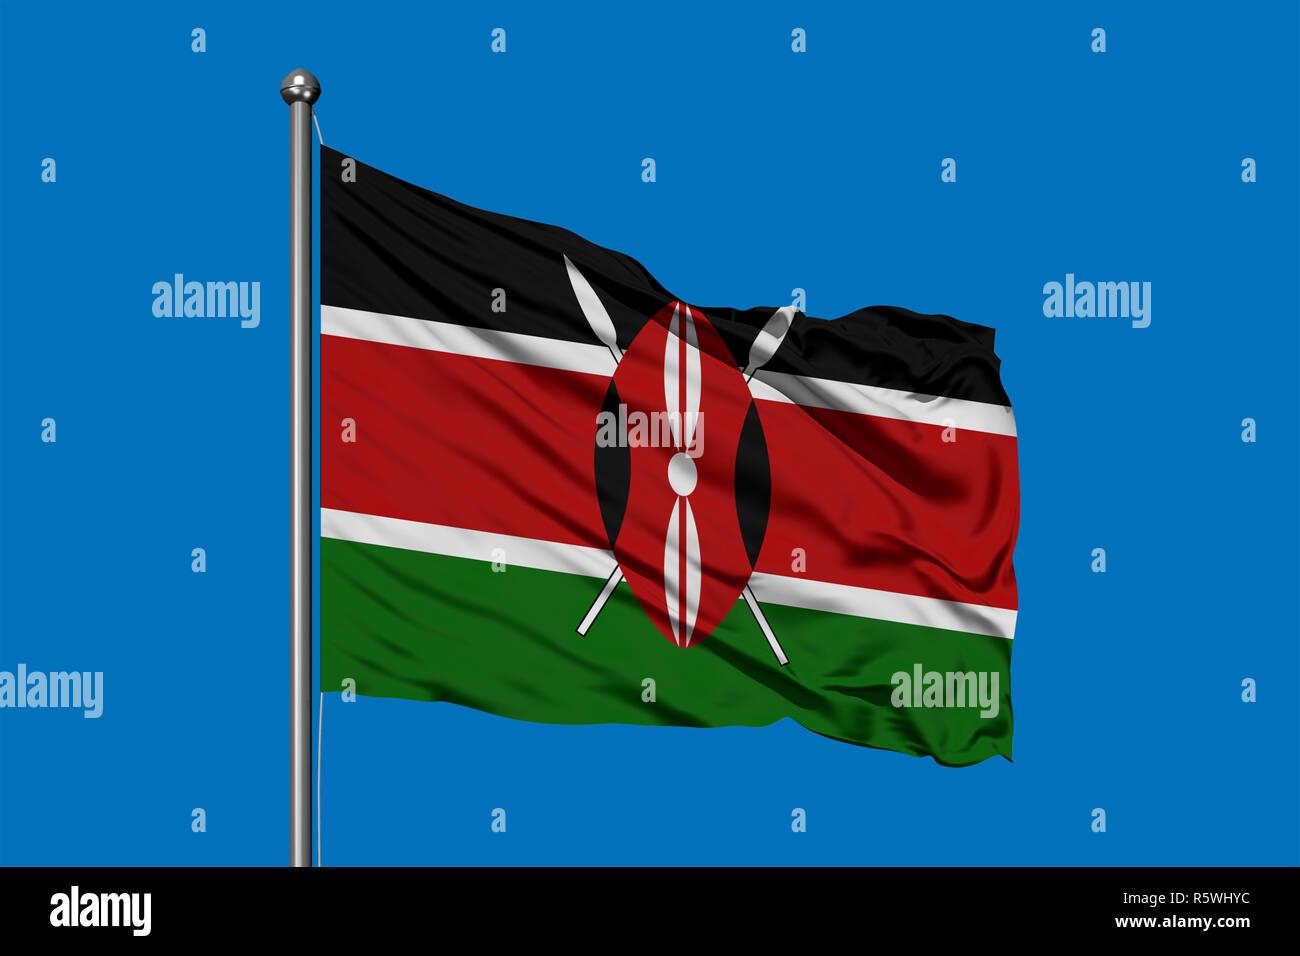 Flag of Kenya waving in the wind against deep blue sky. Kenyan flag. Stock Photo